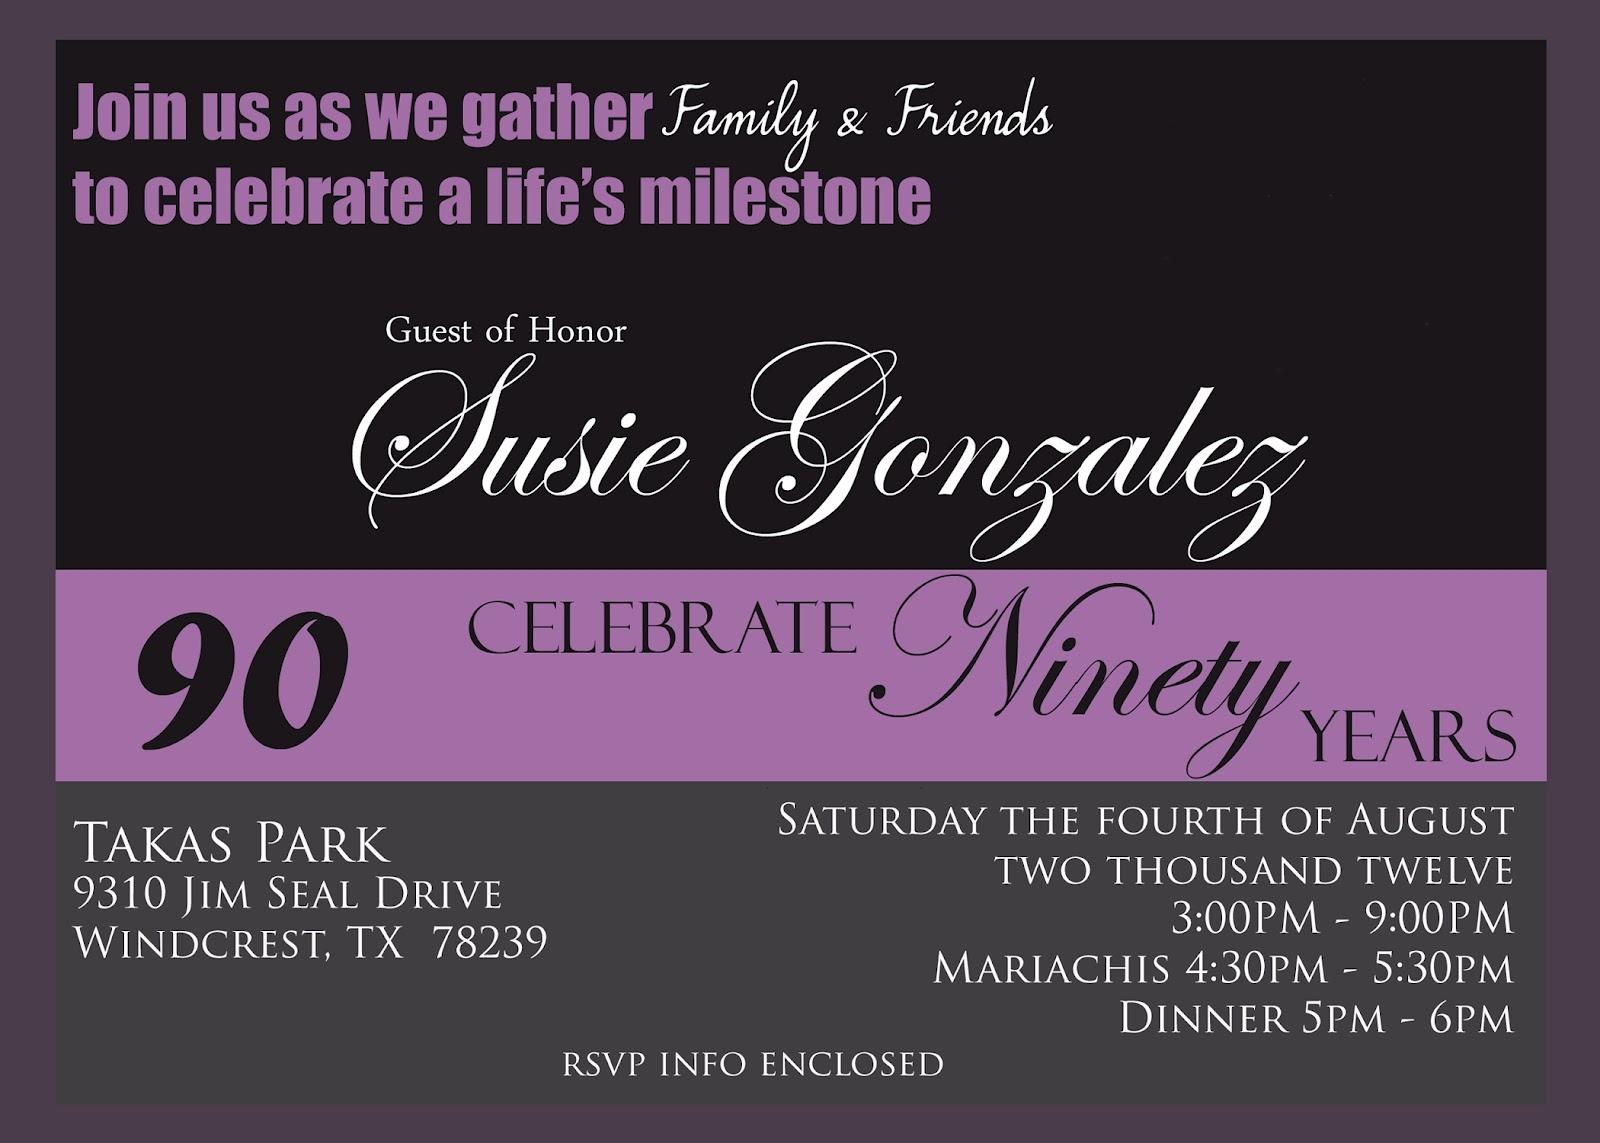 90th birthday invitation templates free - Ideal.vistalist.co